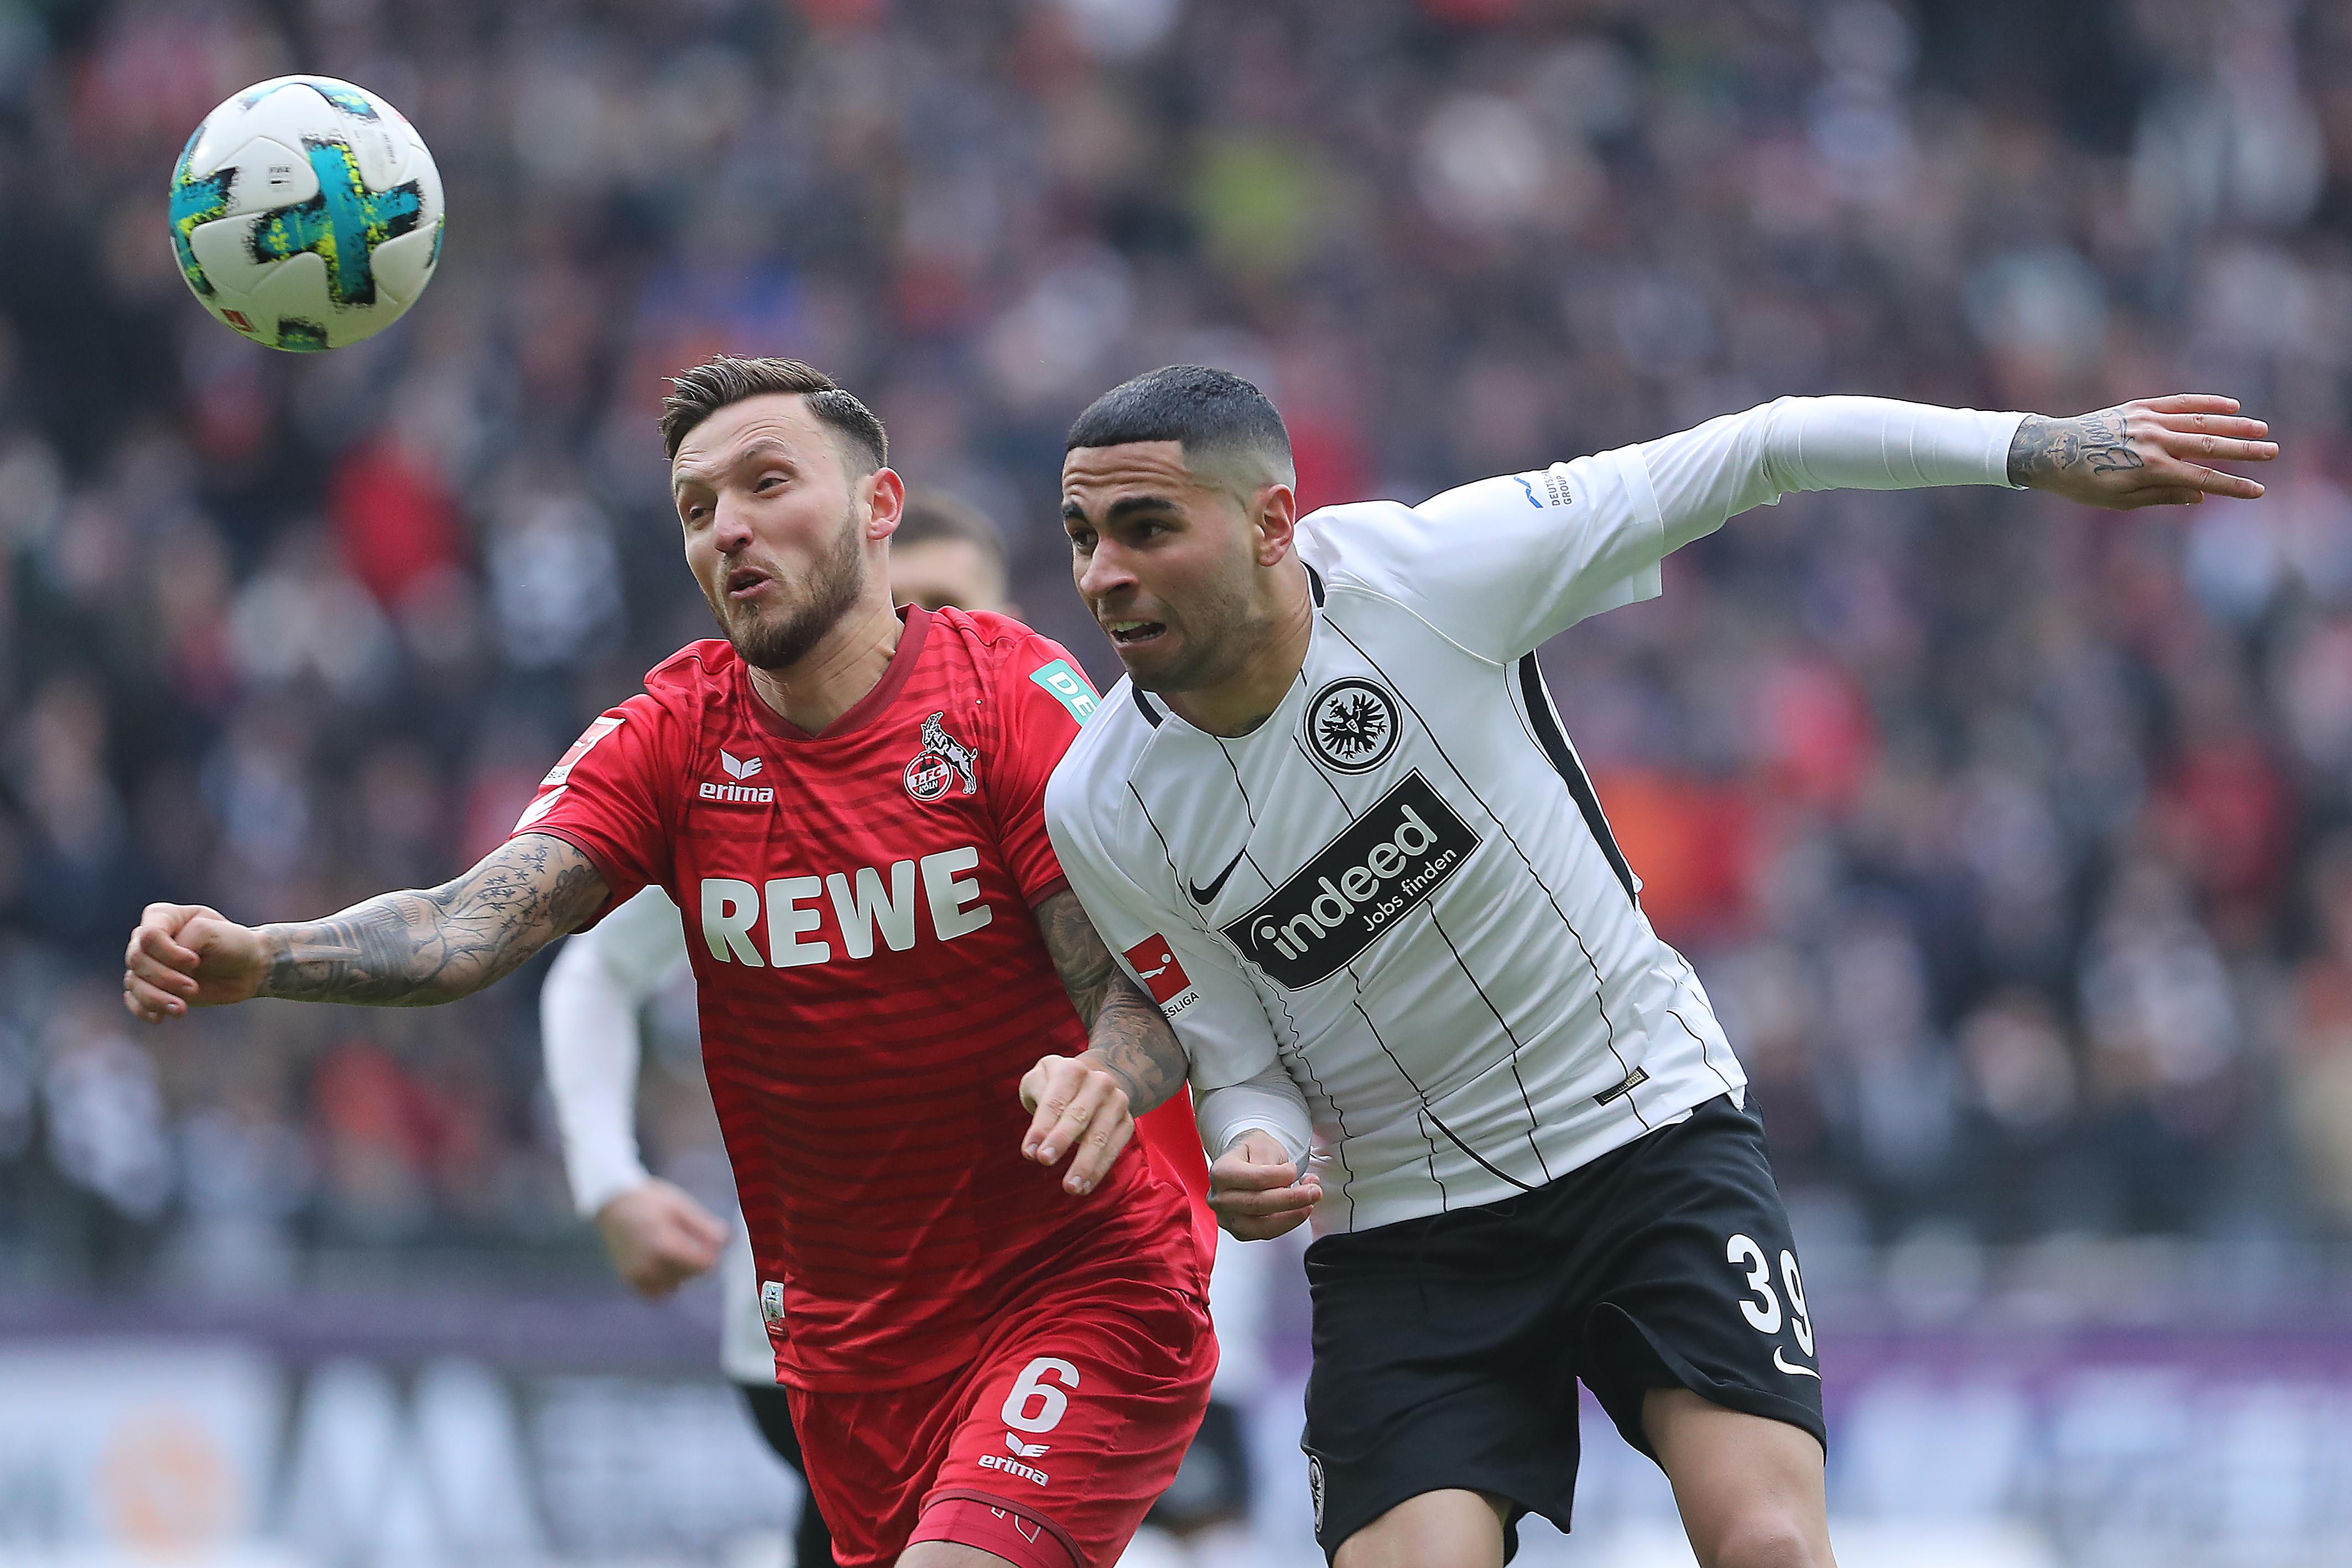 Sin Salcedo y Fabián, Eintracht goleó en casa al Koln